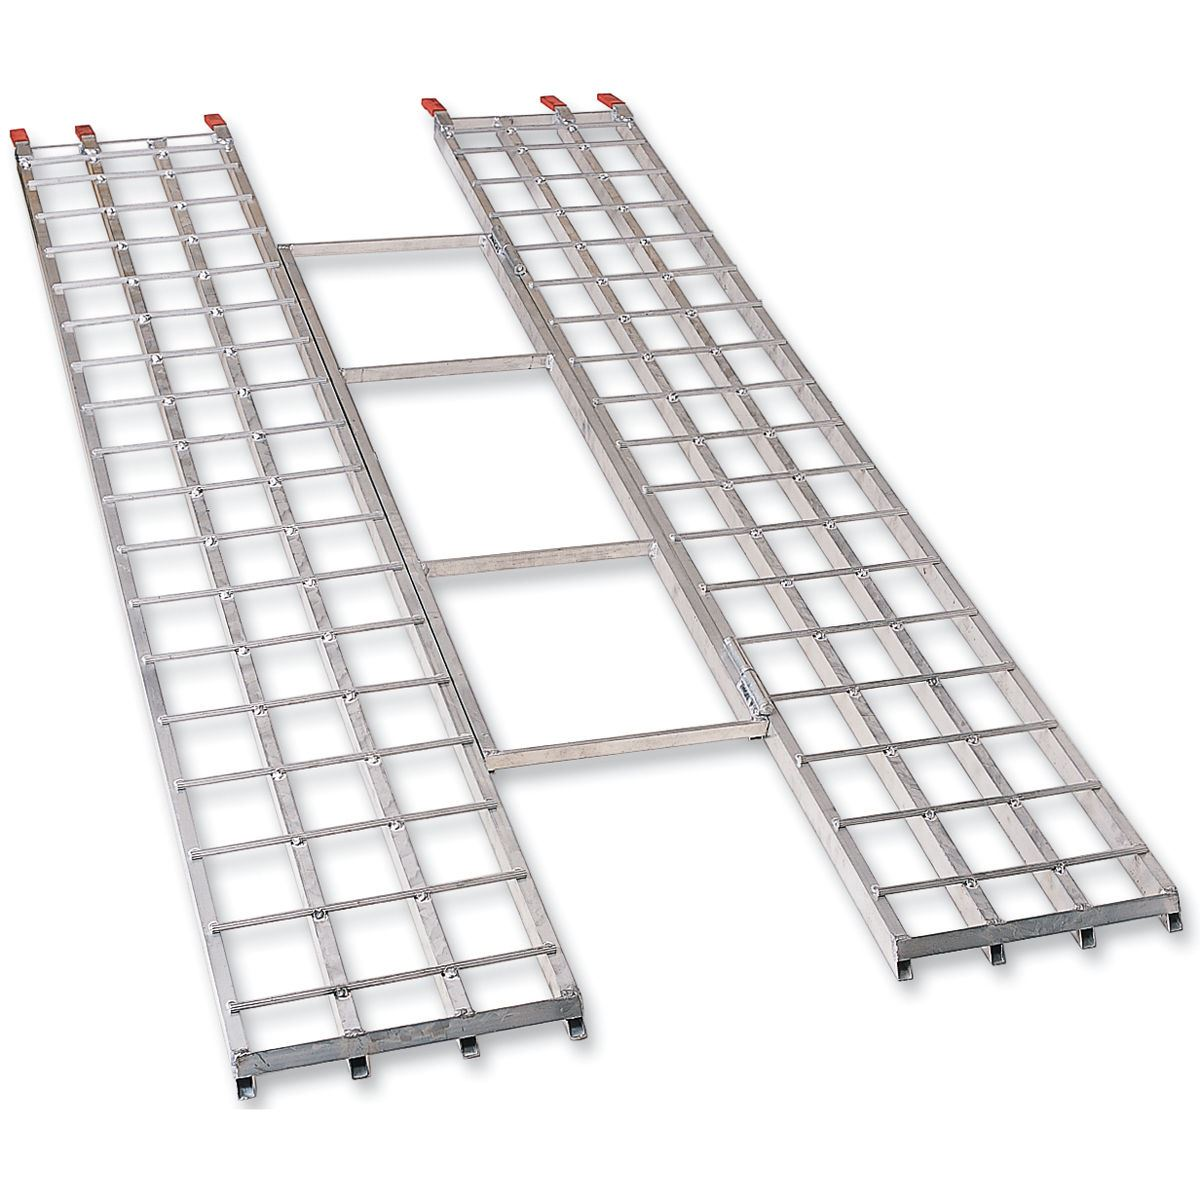 Moose Racing Tri Fold Aluminum Ramp